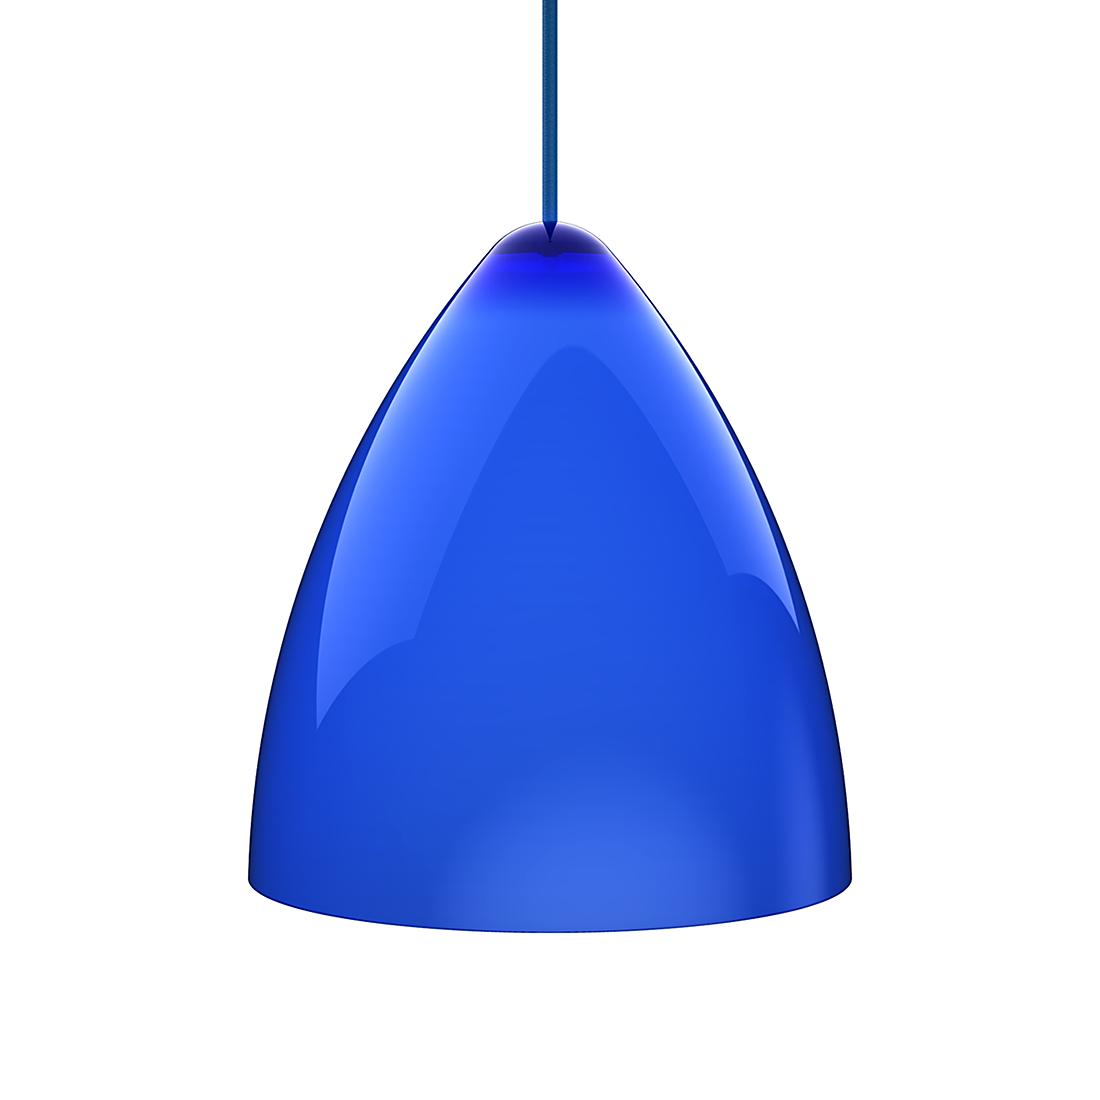 Nordlux Hanglamp Funk - plexiglas/textiel - blauw/blauw (Diameter 27cm) Home24